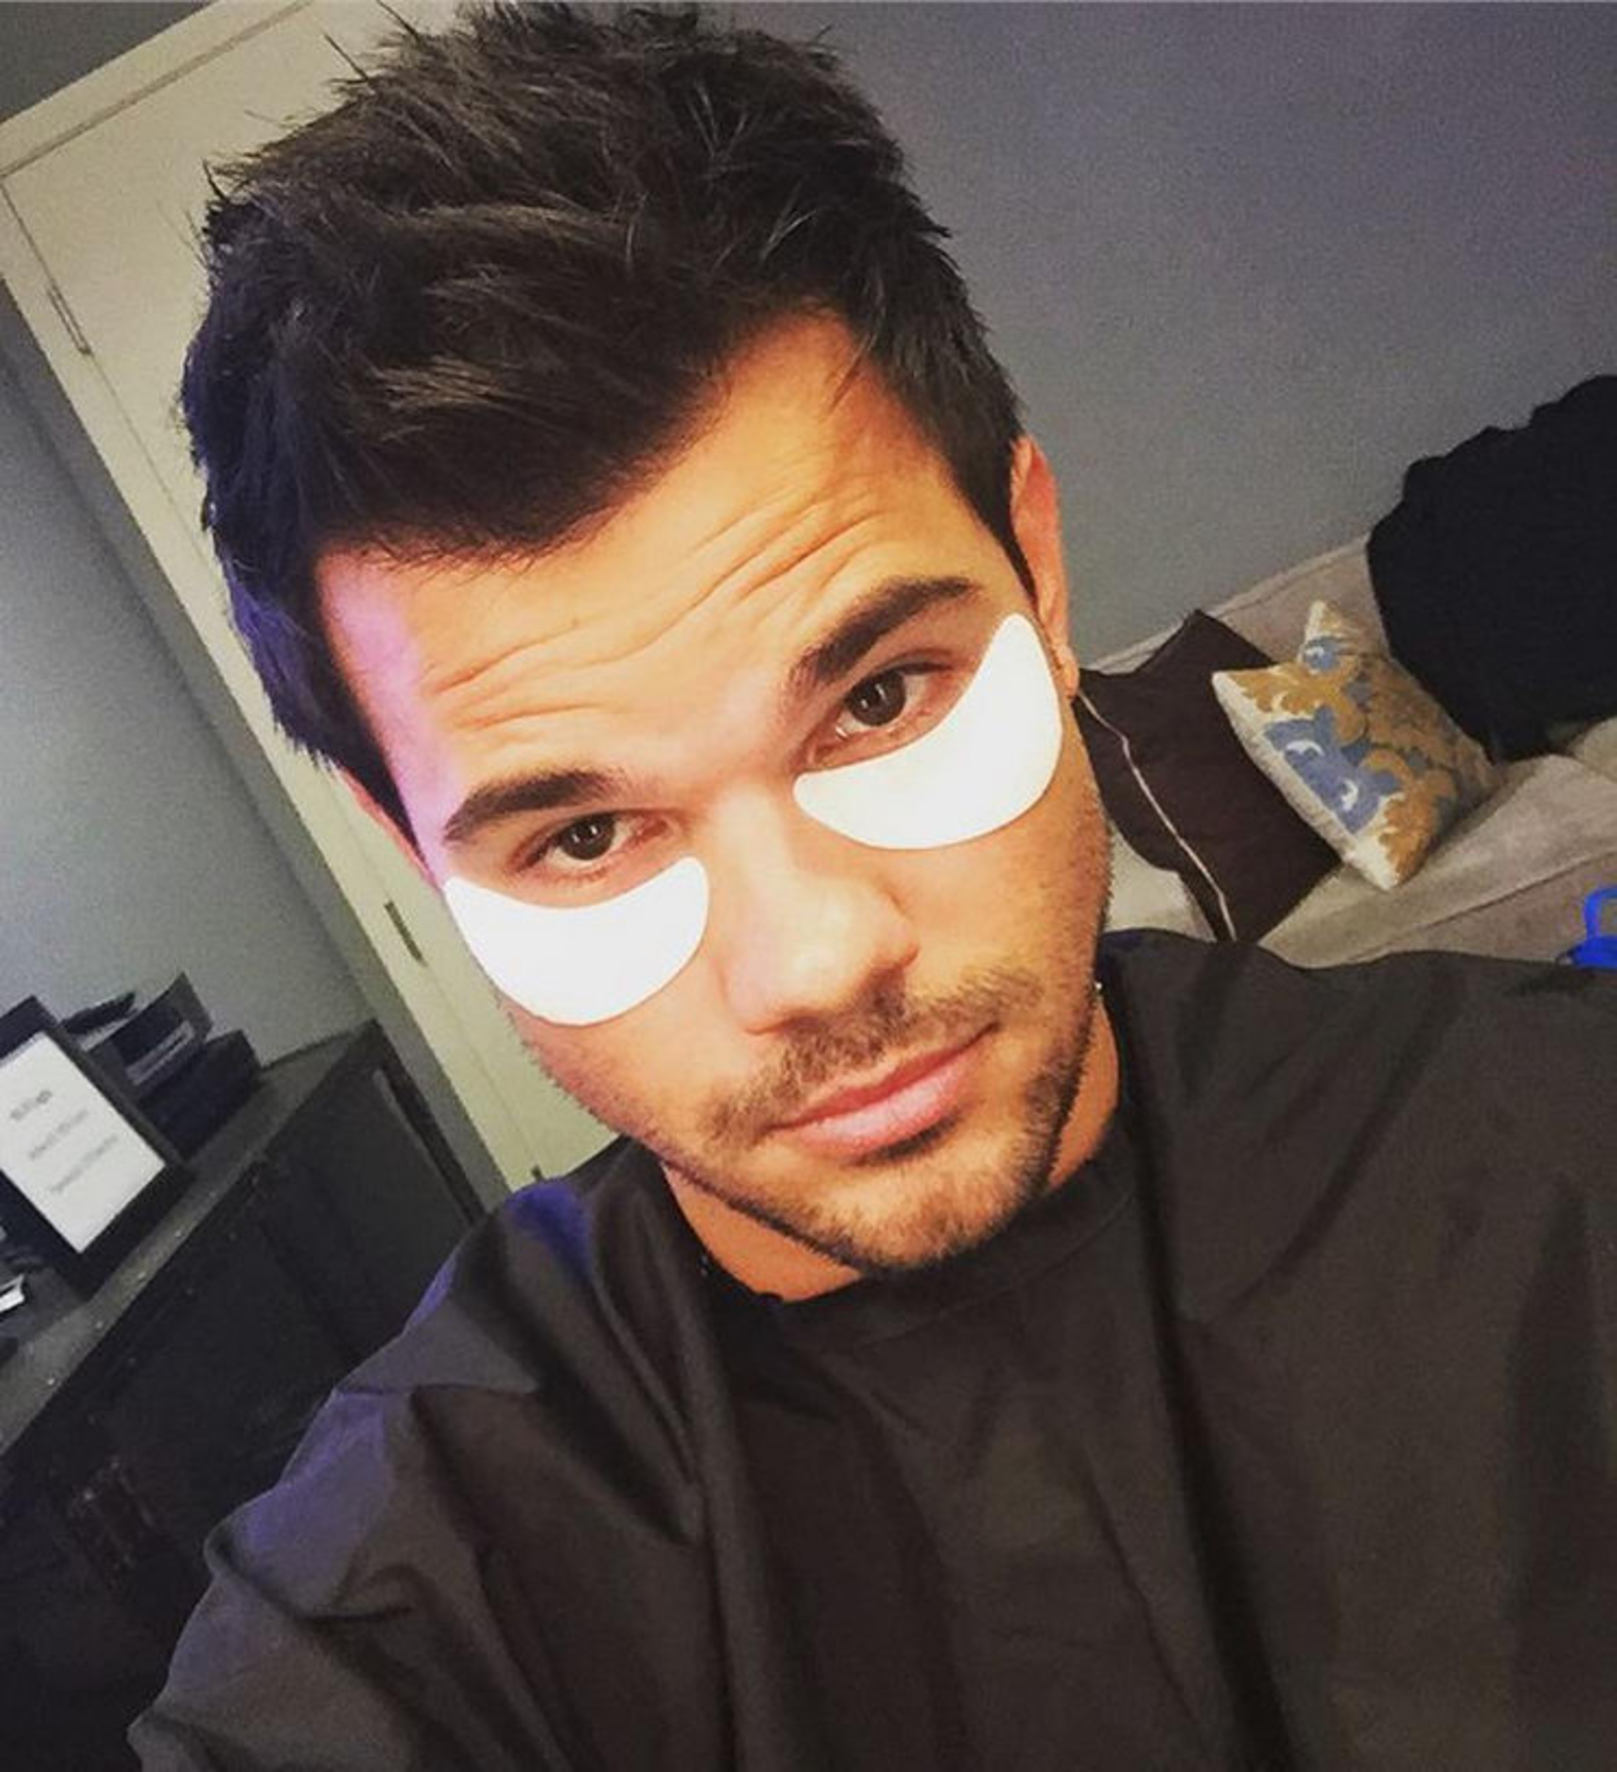 Taylor Lautner - Viva! Katie Holmes Instagram